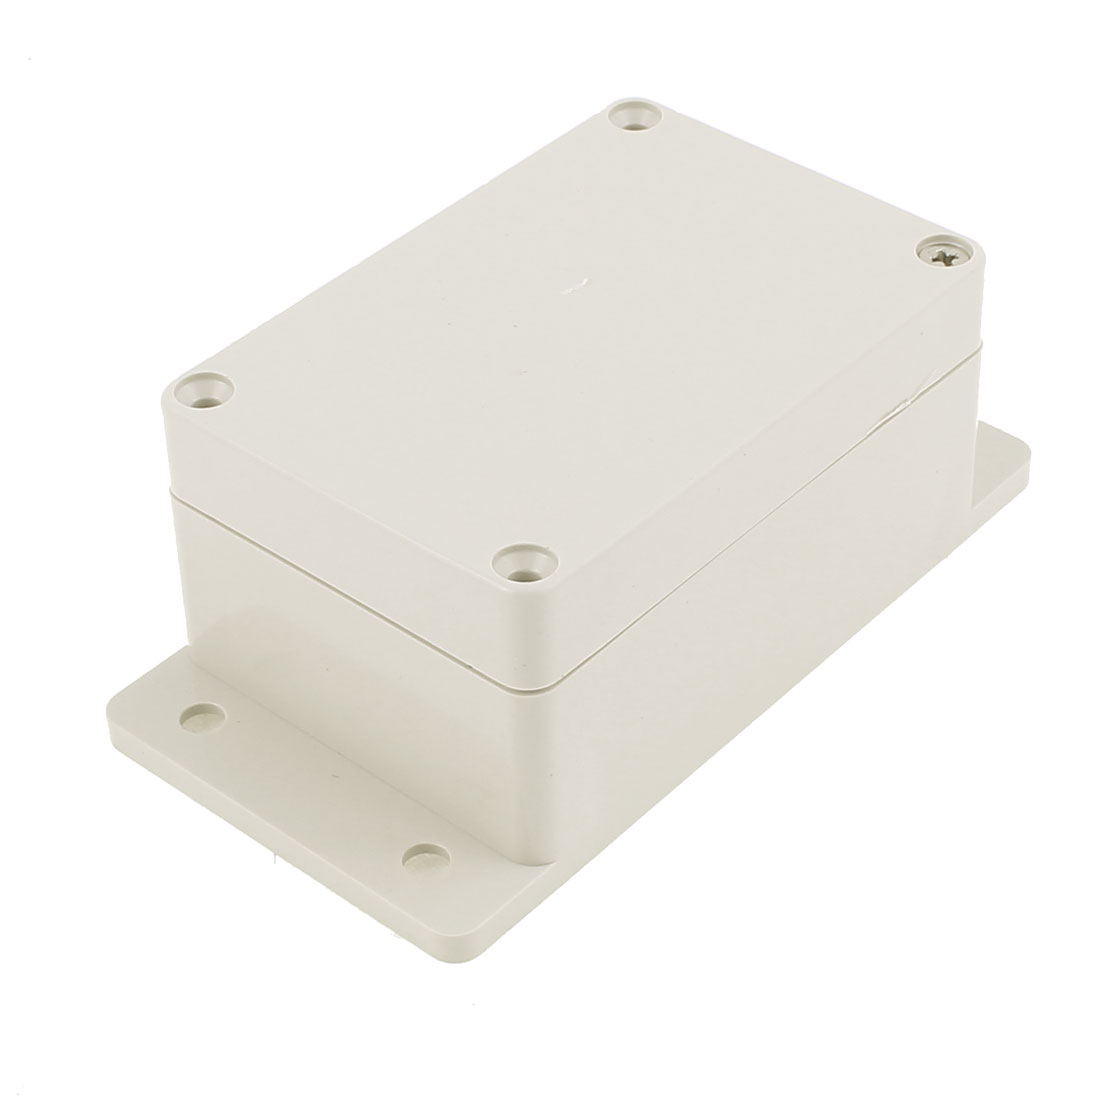 100 x 68 x 50mm Dustproof IP65 Junction Box Terminal Connection Box Enclosure